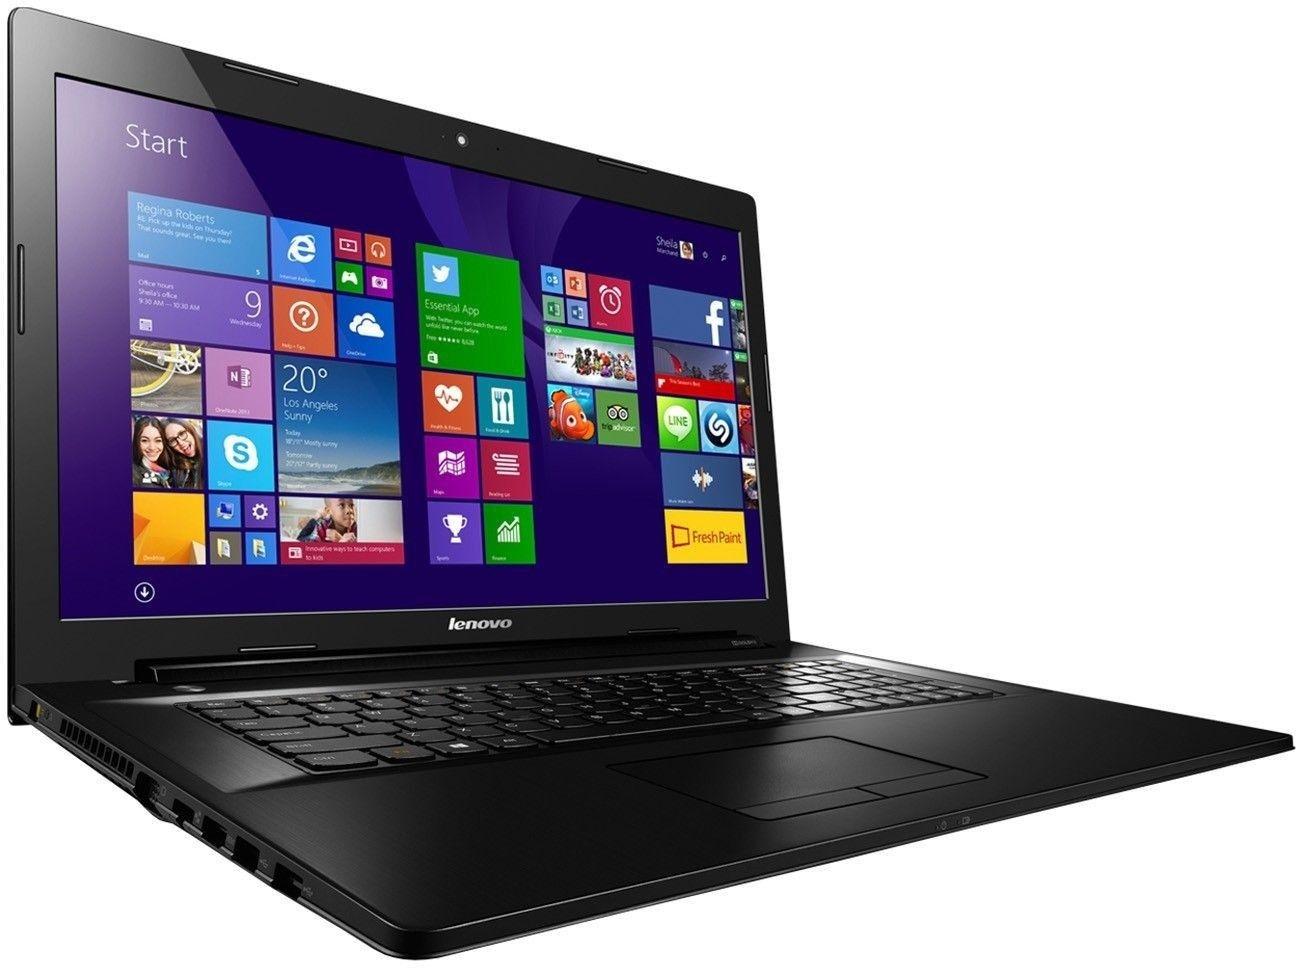 Ноутбук Lenovo IdeaPad G70-80 (80FF00DEUA) - 2